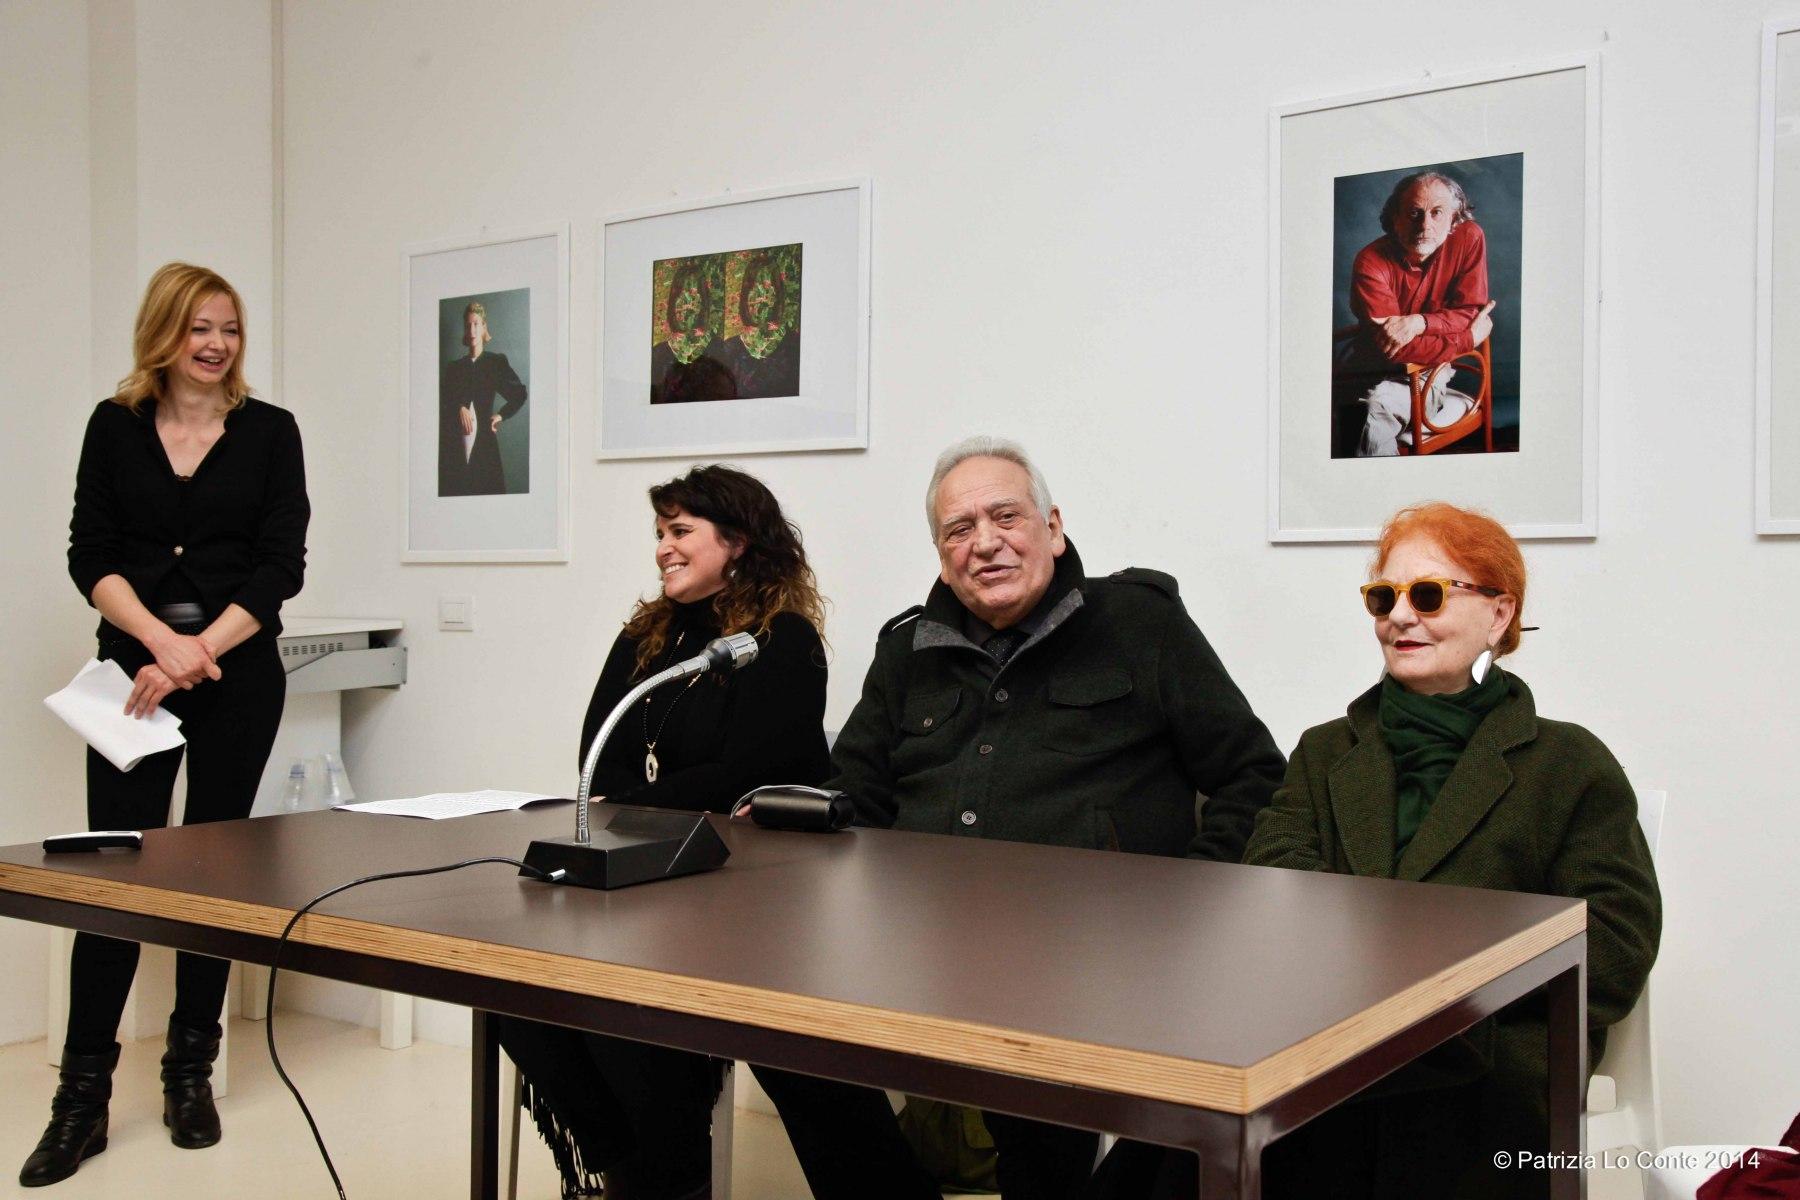 Patrizia-Lo-Conte-Mulas-museo-Nori-2014-3227